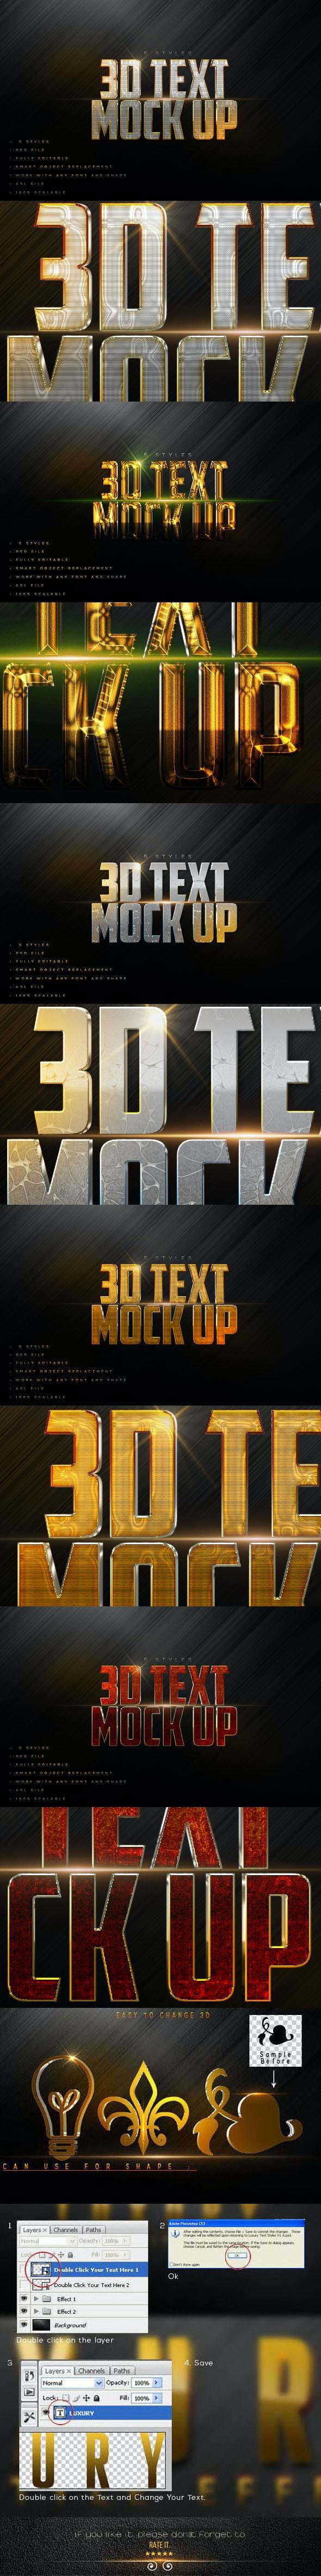 Marvelous Text Styles VC9 - Styles Photoshop